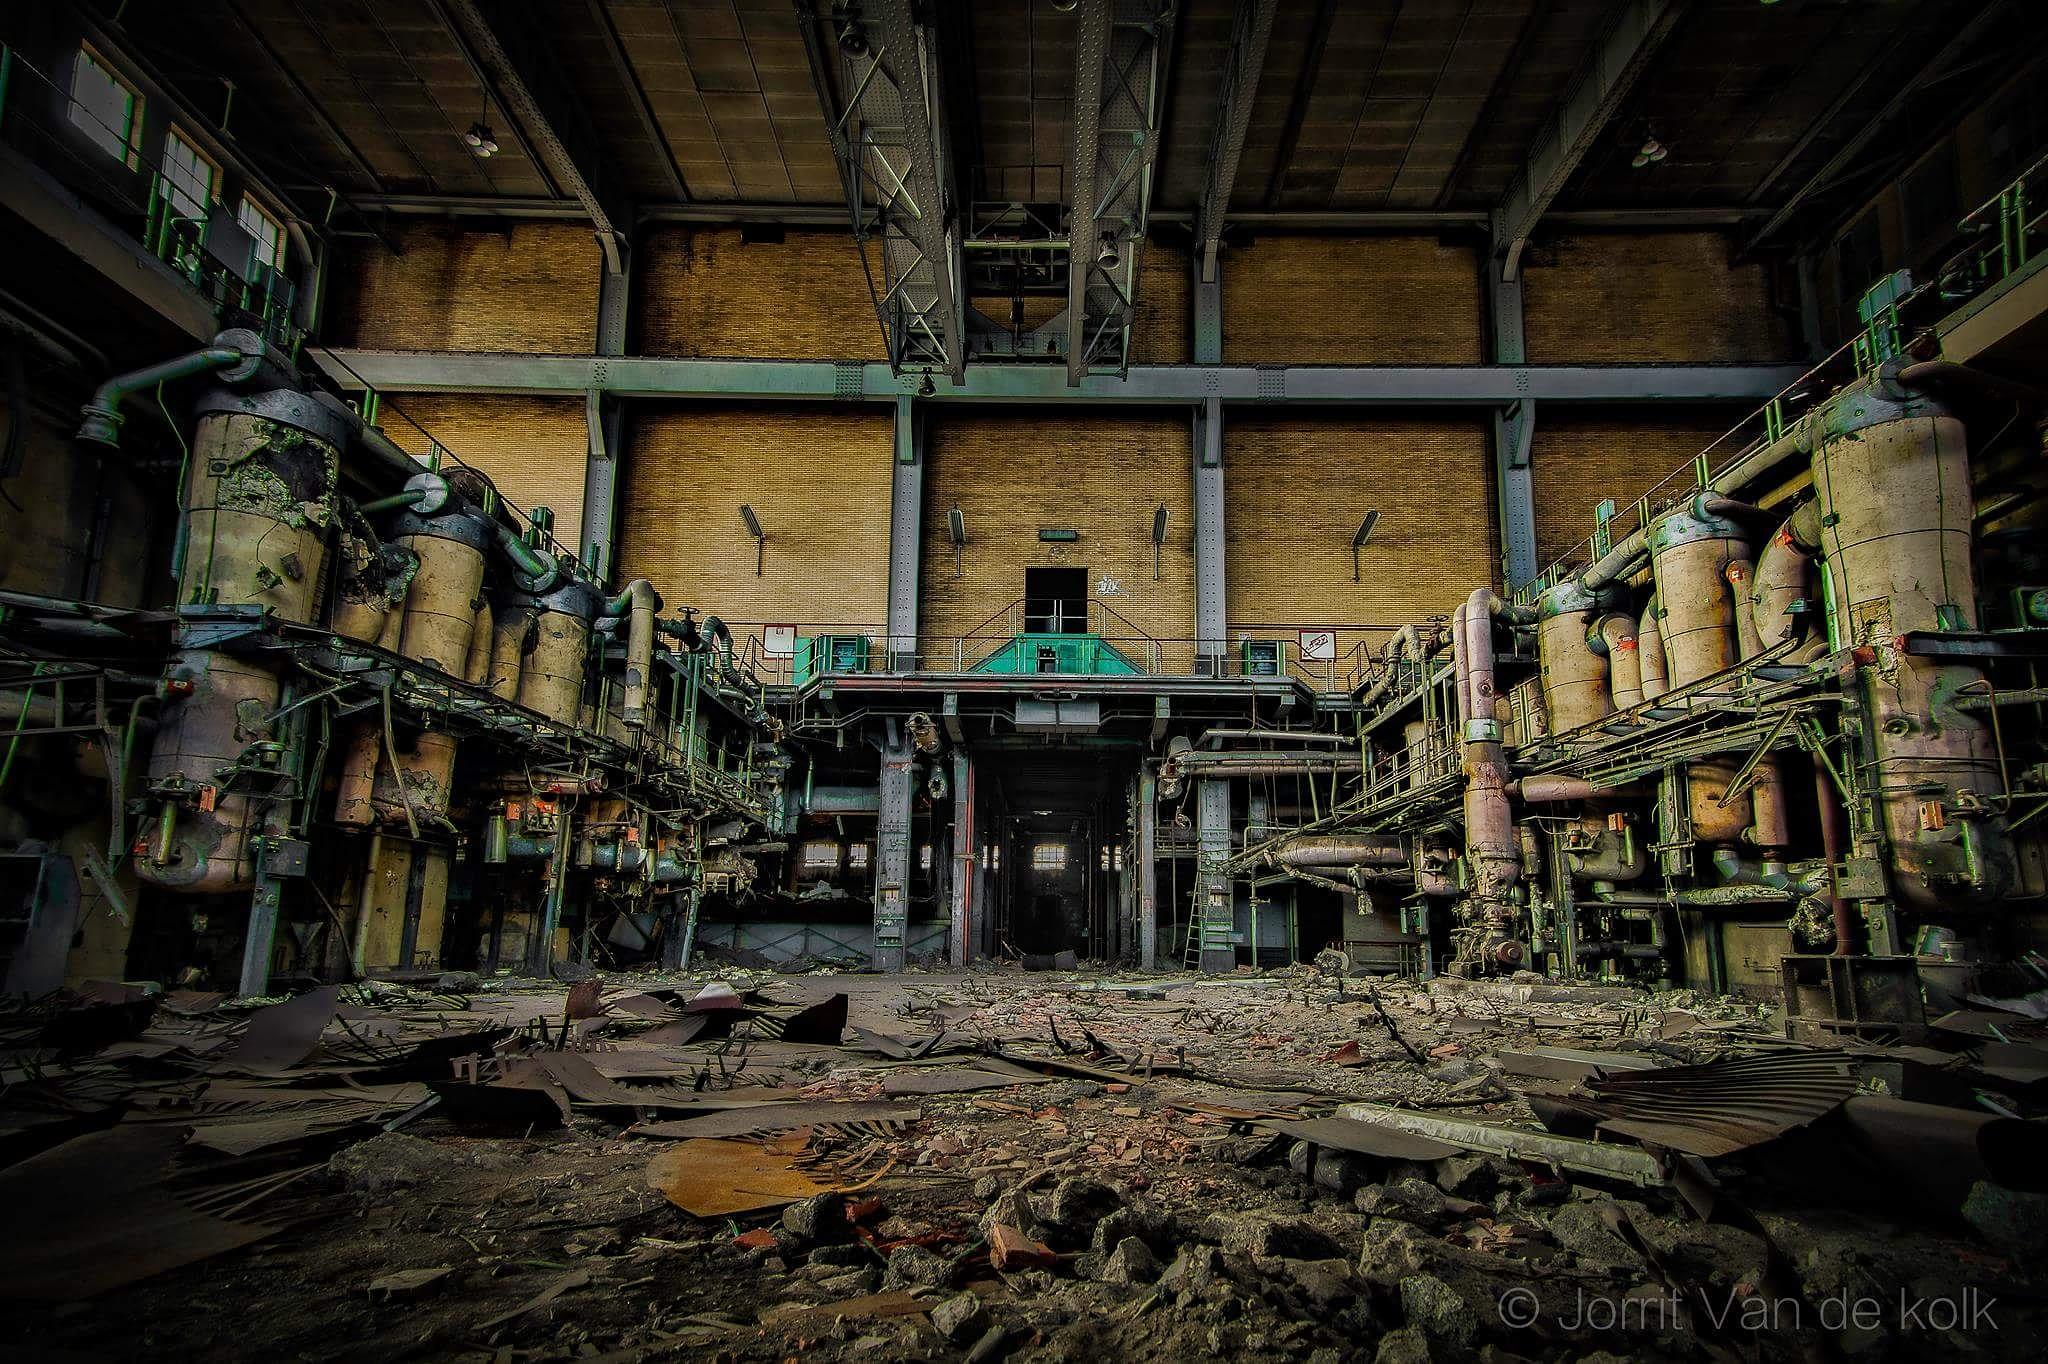 abandoned steel factory by Jorrit van de kolk